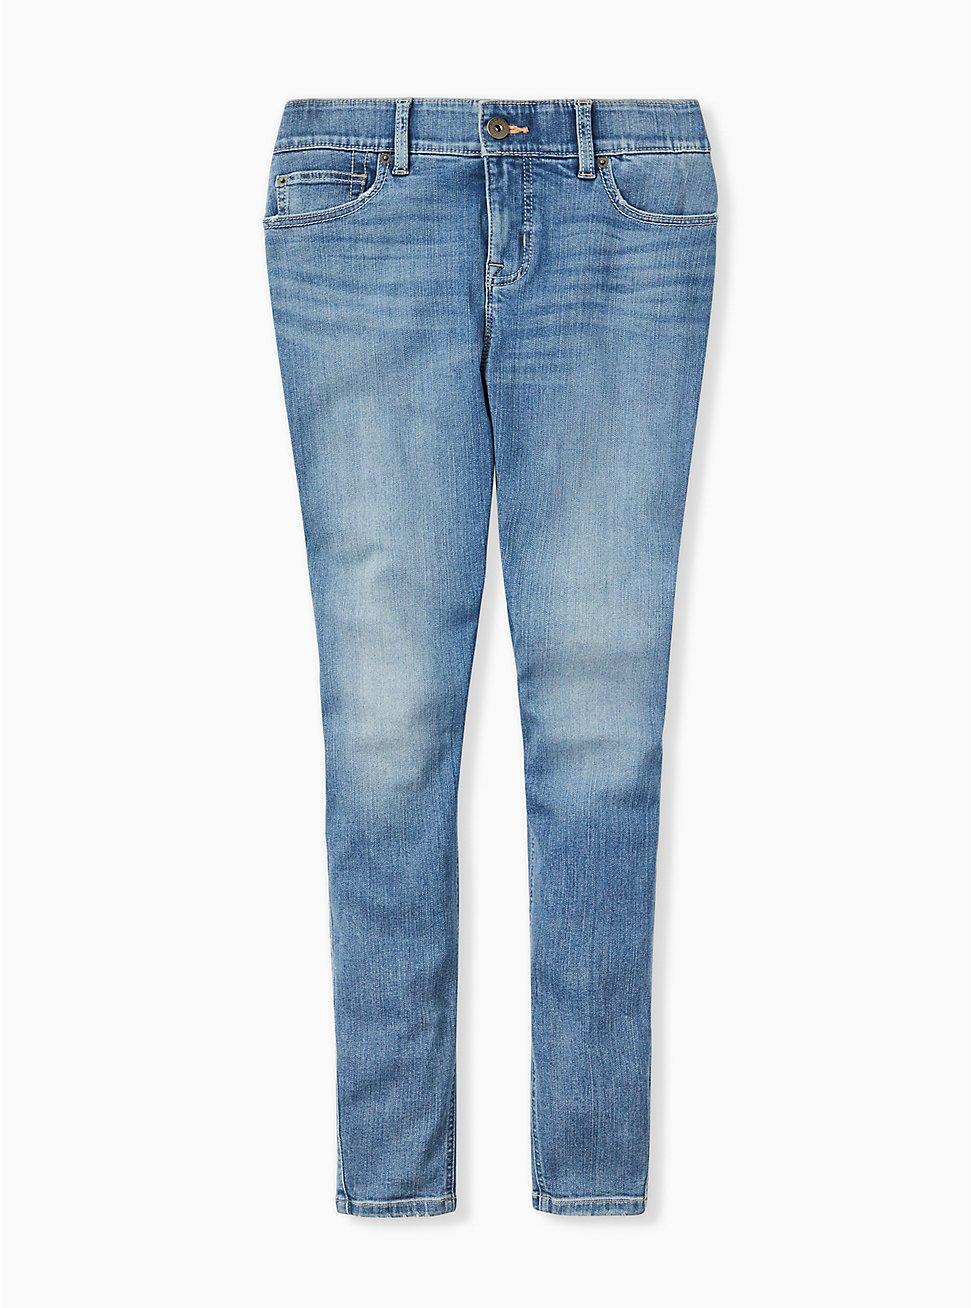 Plus Size Bombshell Skinny Jean - Premium Stretch Medium Wash, GREENWICH, hi-res